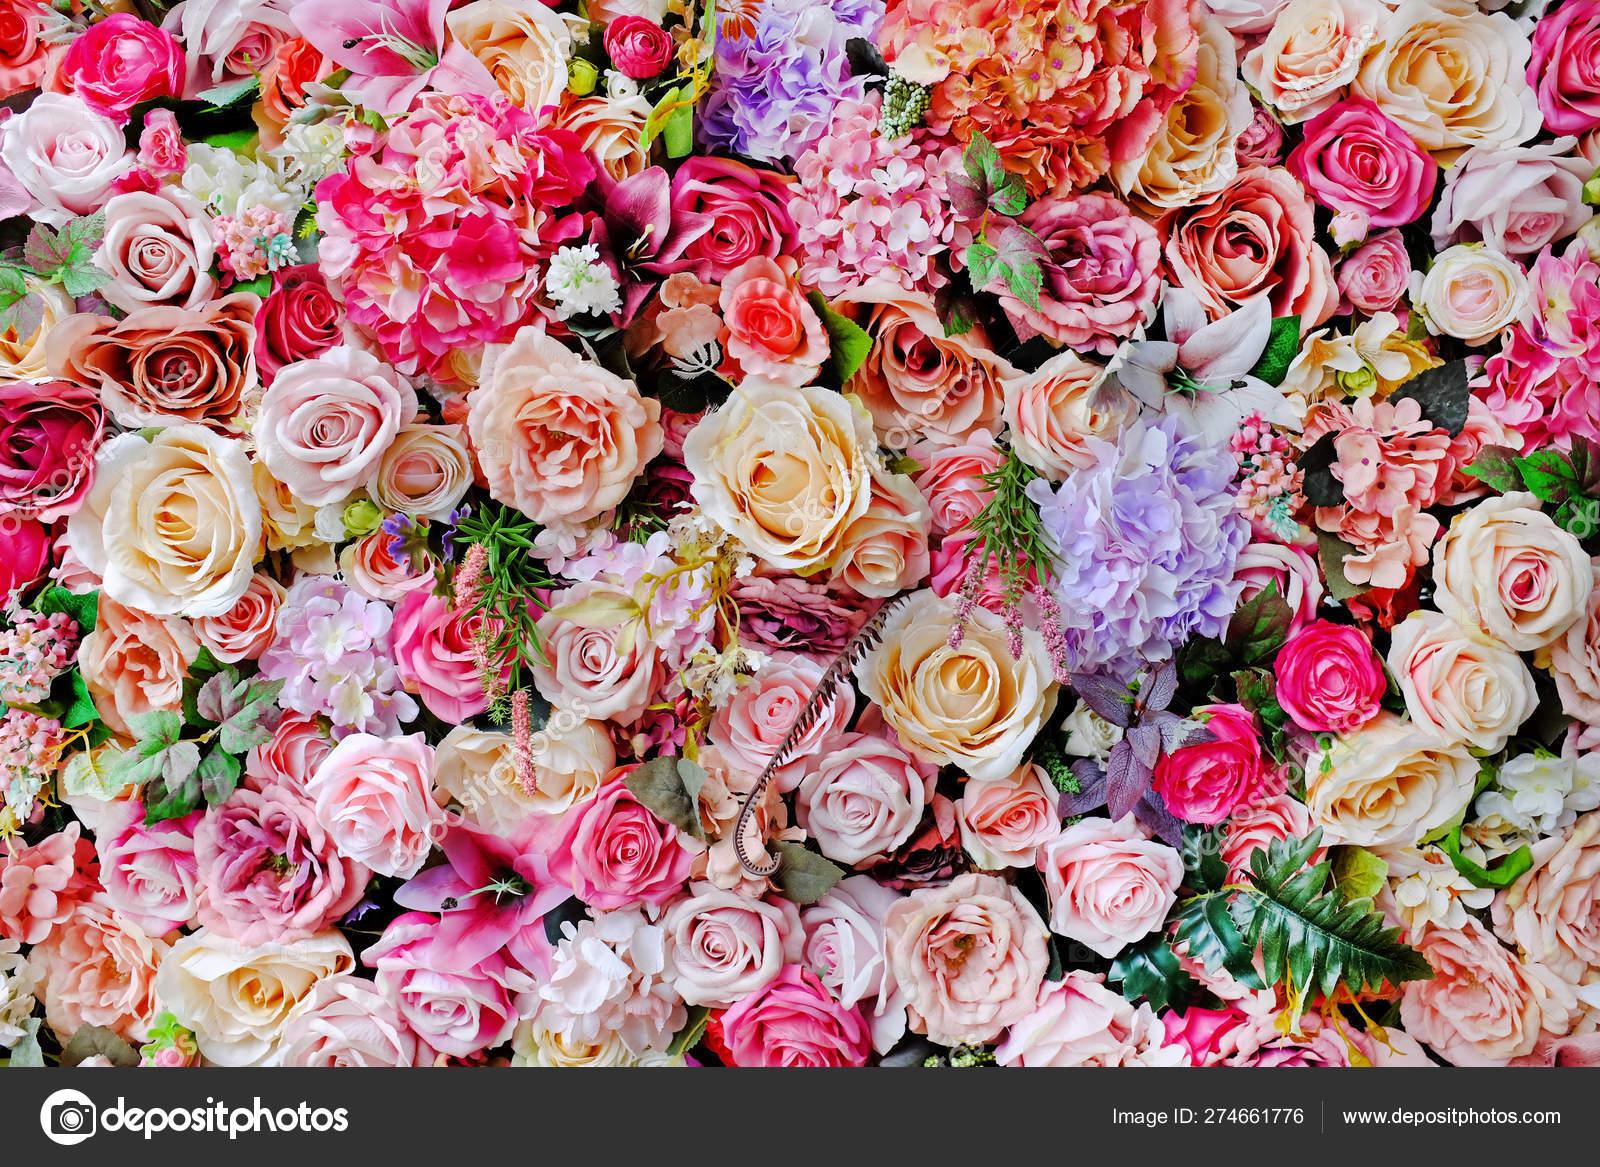 Beautiful Colors Plastic Rose Lilly Flower Bouquet Different Flowers Decorative Stock Photo C Civic Dm Hotmail Com 274661776